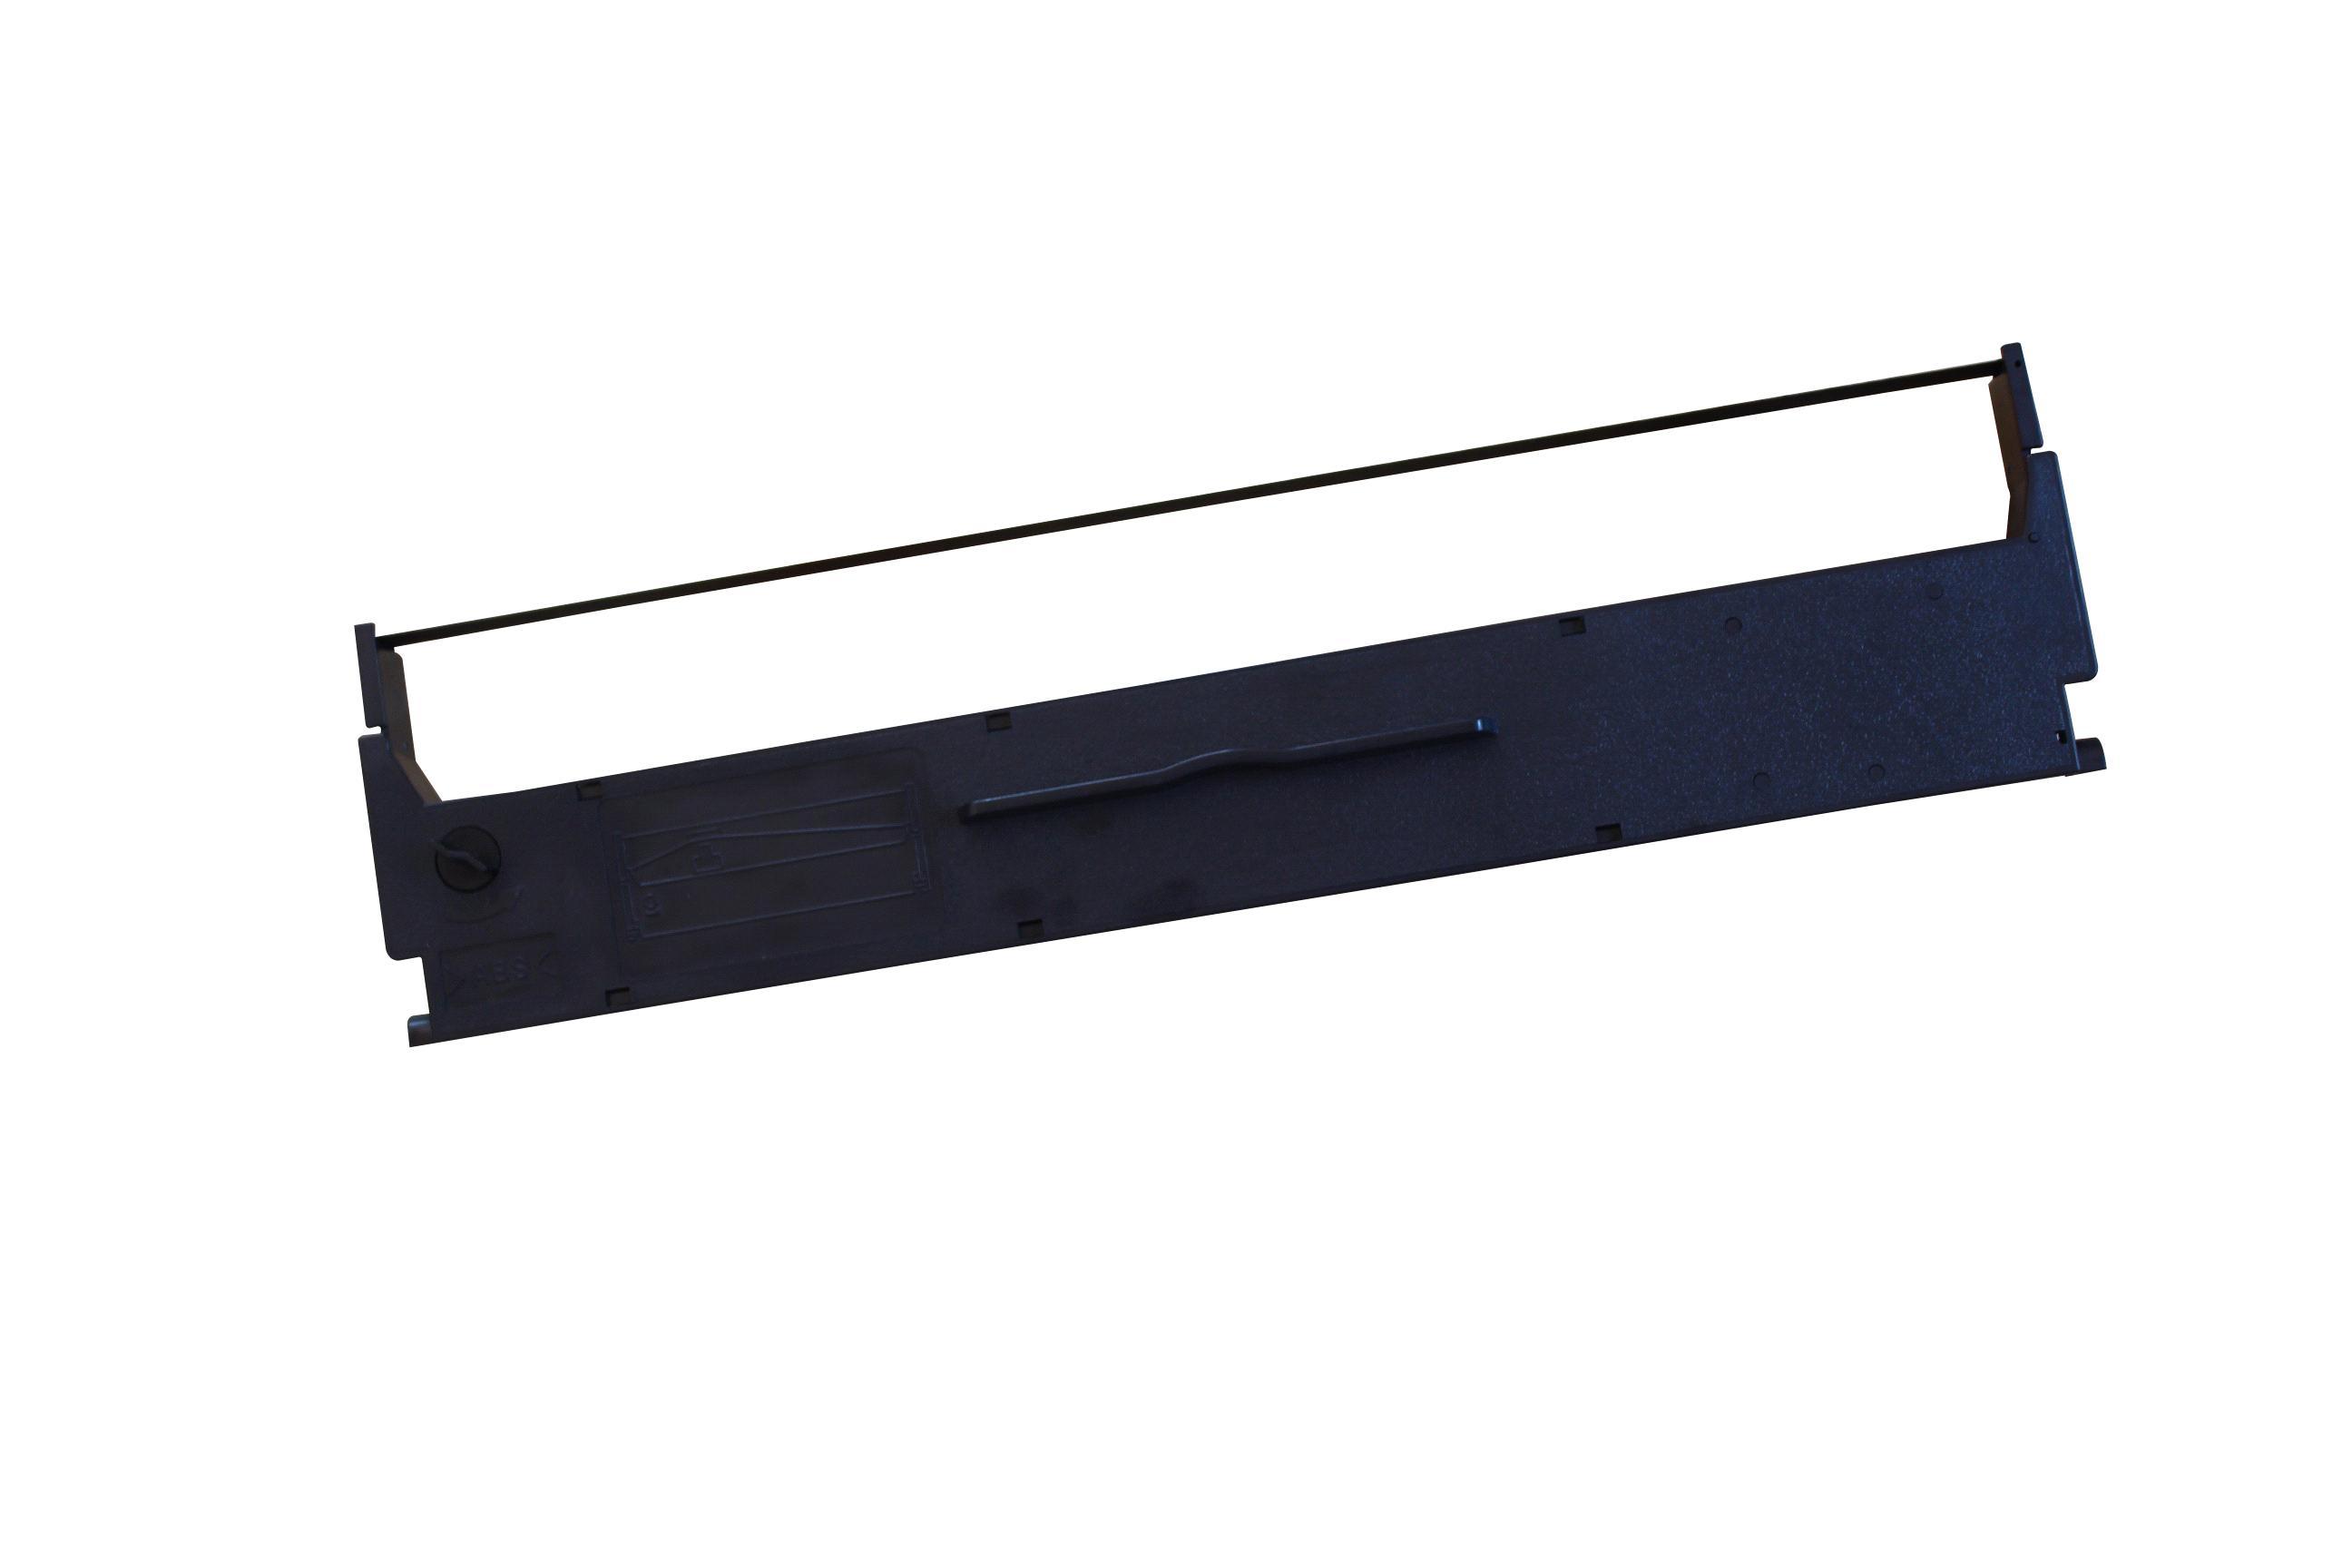 Băng Mực Máy In Kim EPSON-LQ310 - Hàng Bóc Máy